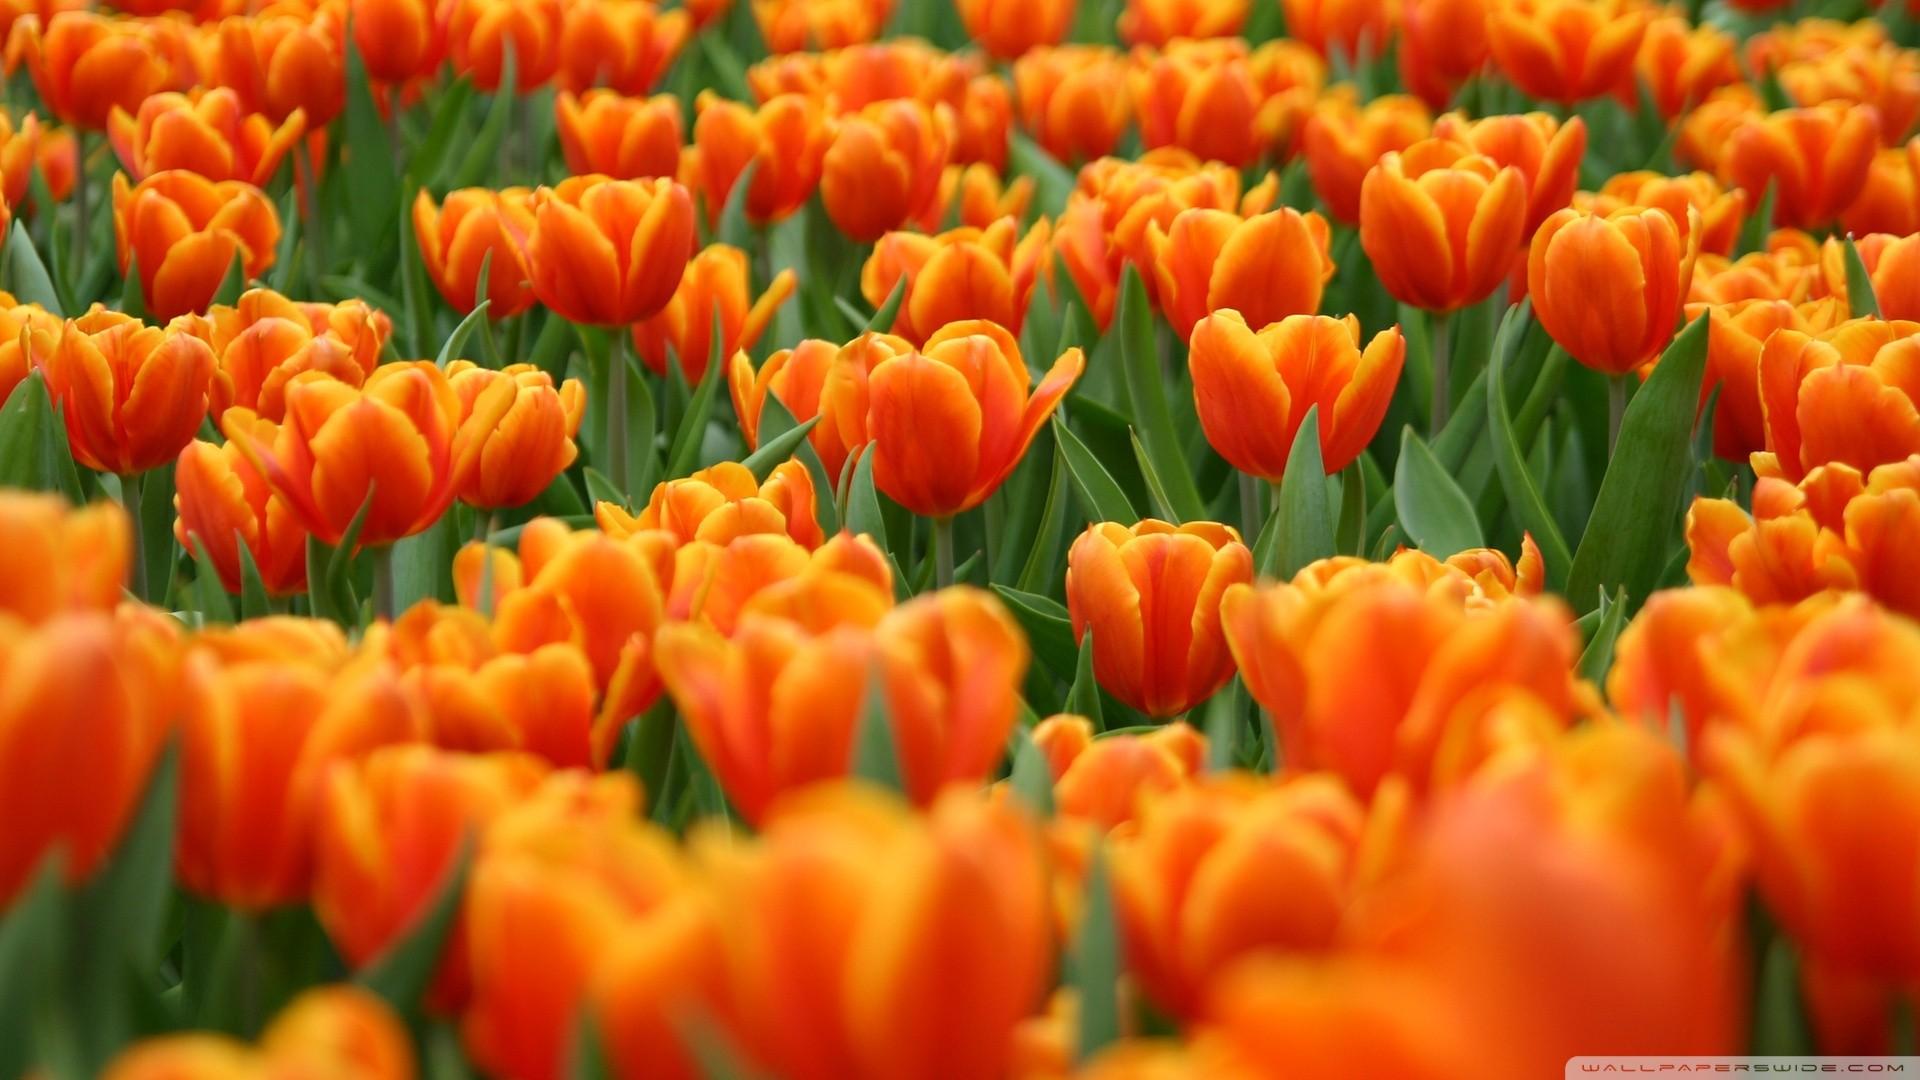 Orange Tulips Spring Flowers Wallpaper Desktop Wallpapers   Spring 1920x1080